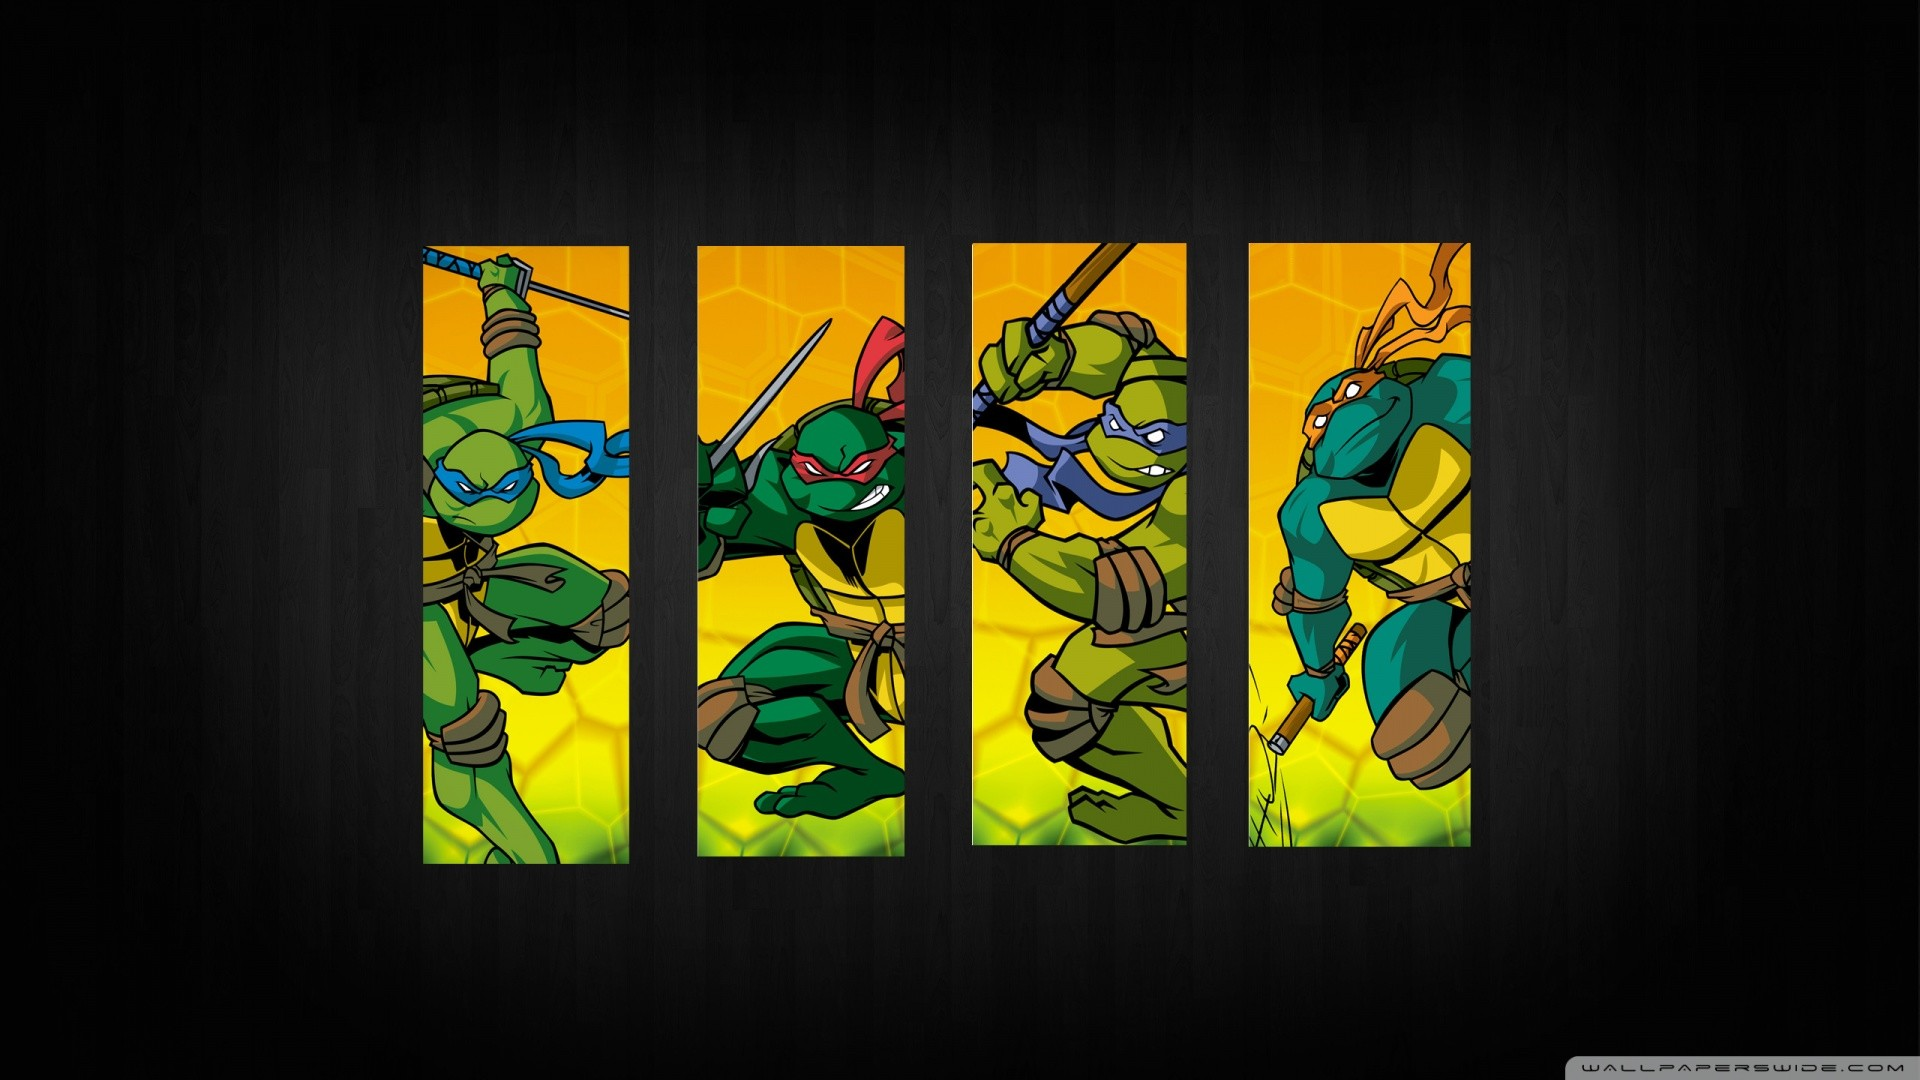 … Teenage Mutant Ninja Turtles II: The Arcade Game – Fanart – Background  …